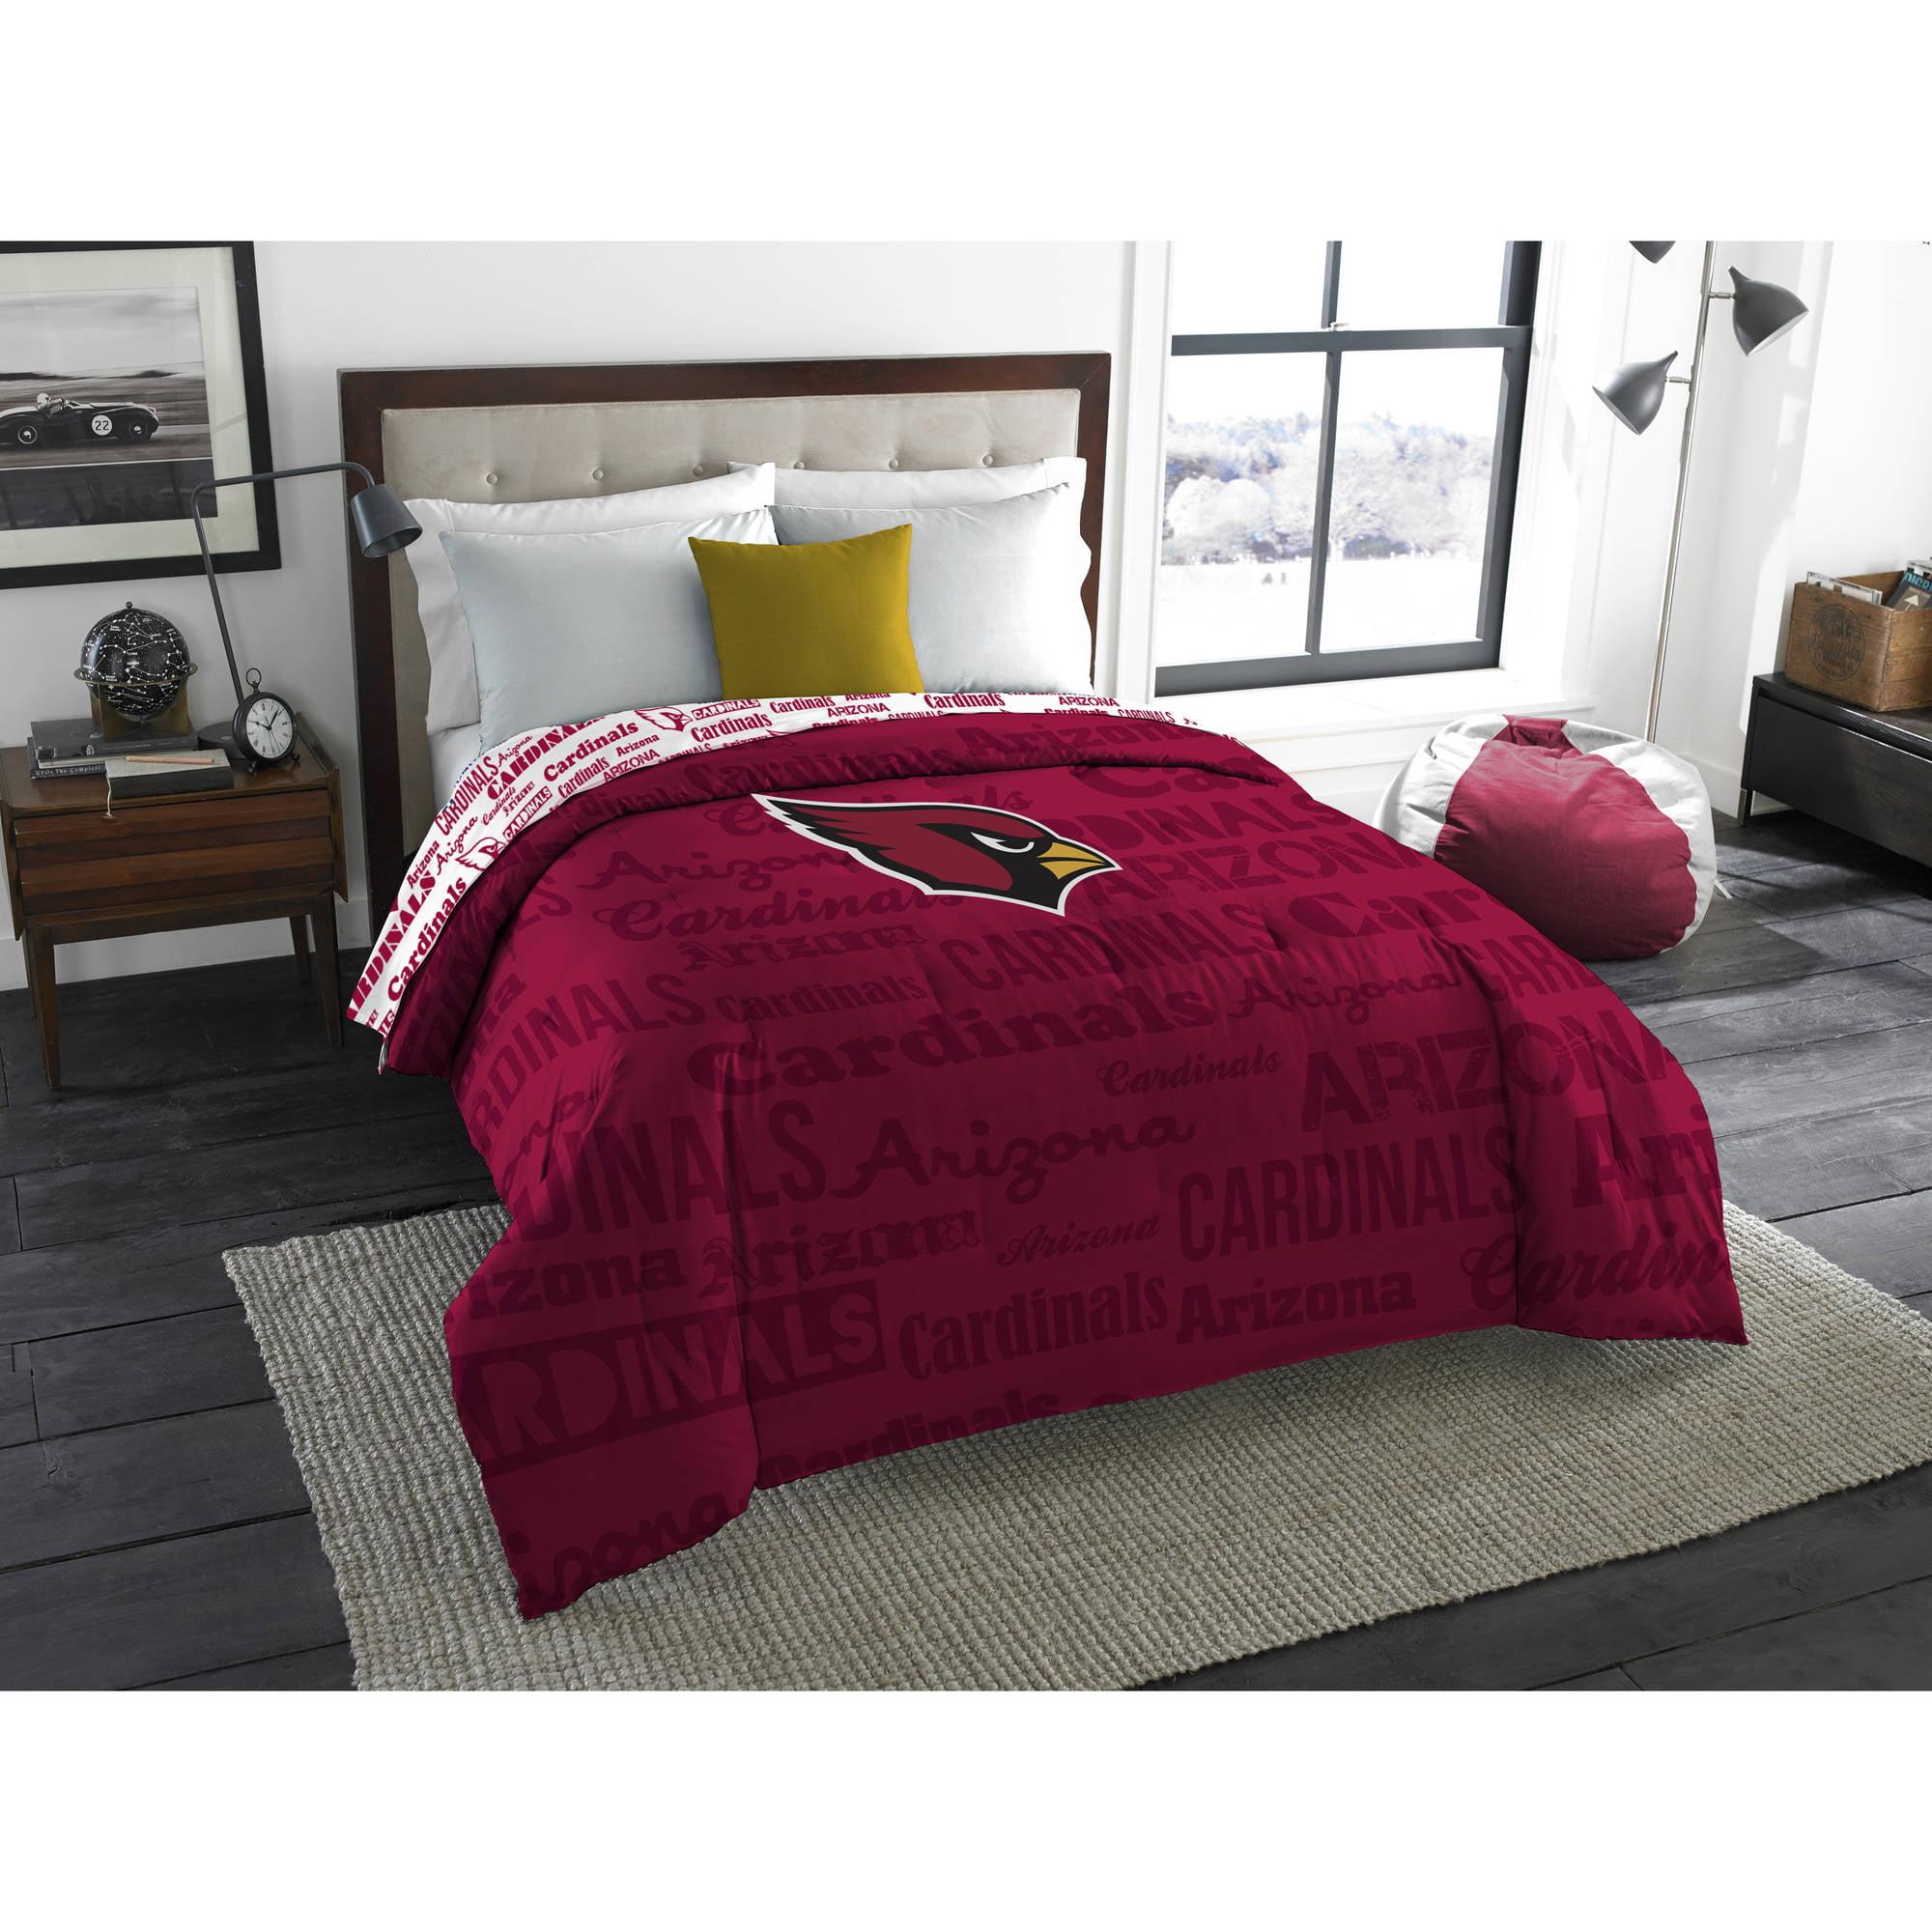 "NFL Arizona Cardinals ""Anthem"" Twin/Full Bedding Comforter"